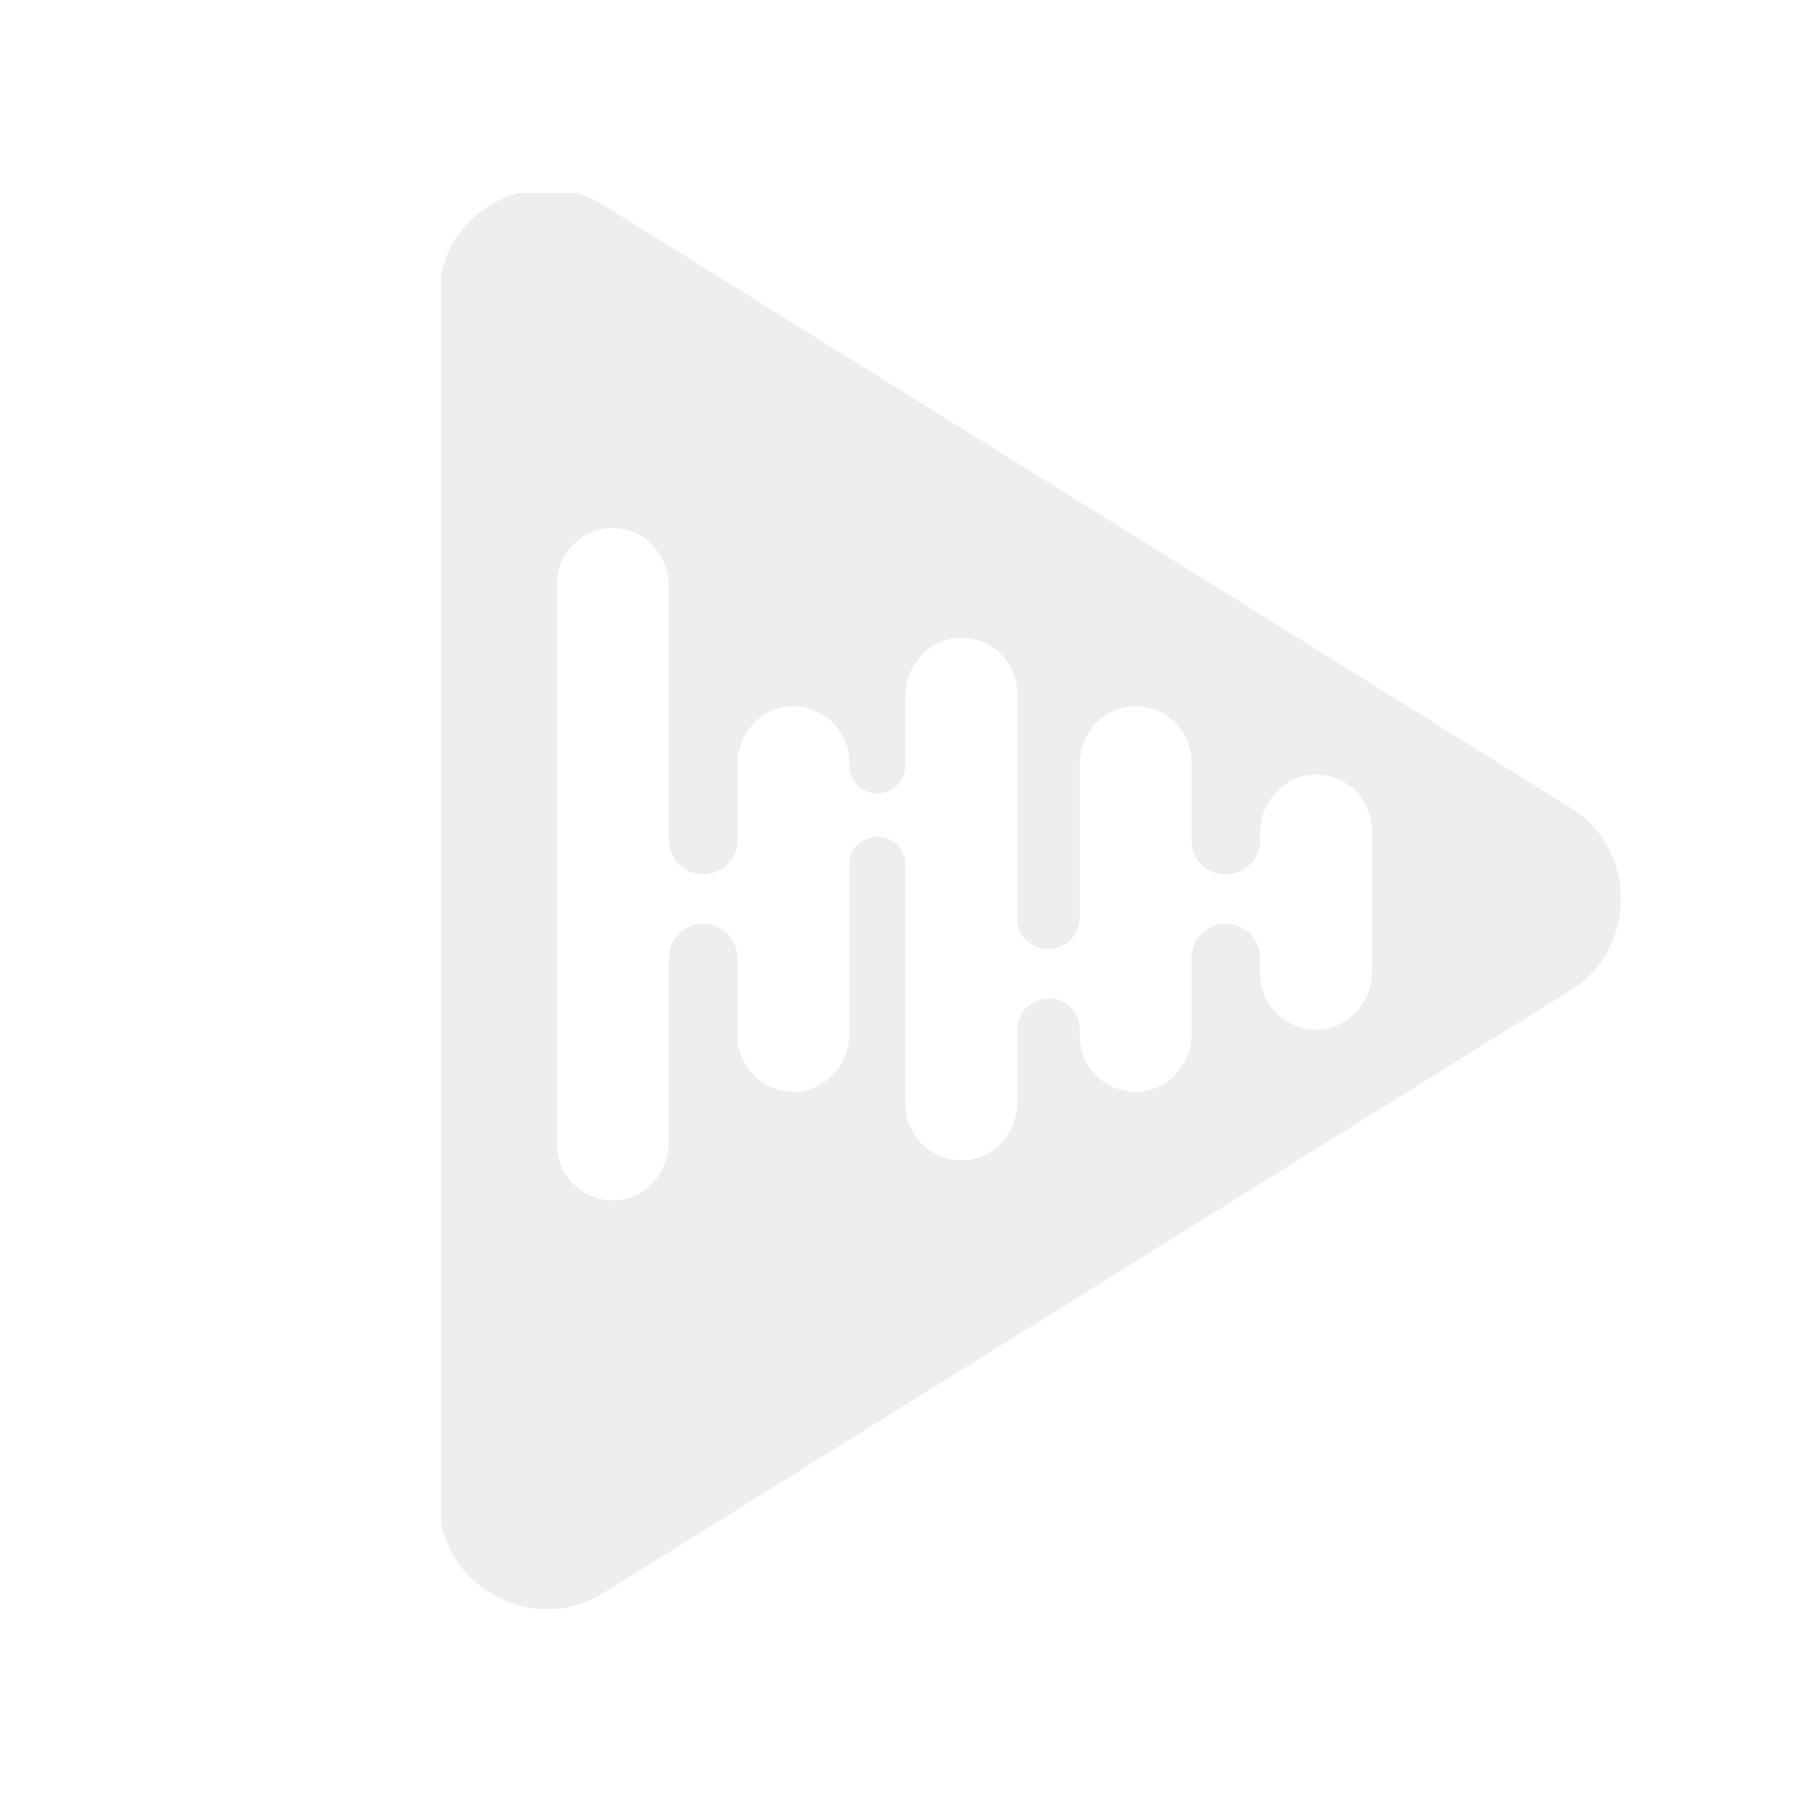 Audison AP8.9 BIT-AUDI2